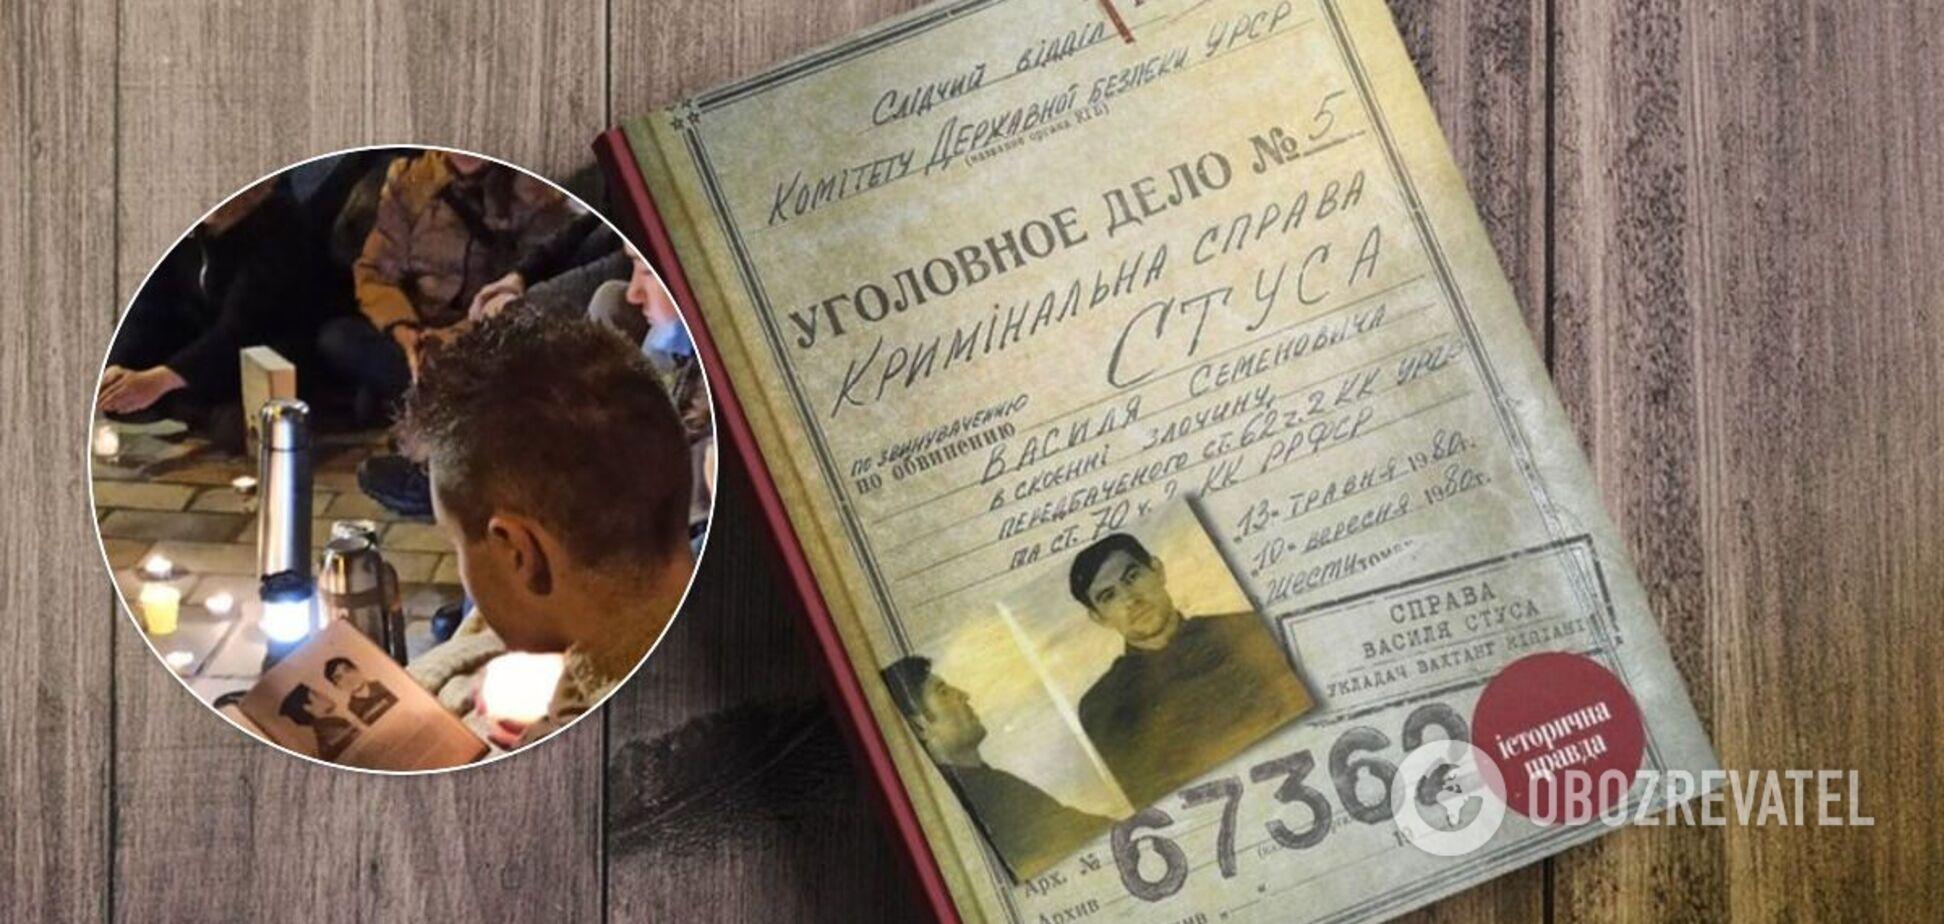 Кияни влаштували масове читання 'Справи Василя Стуса'